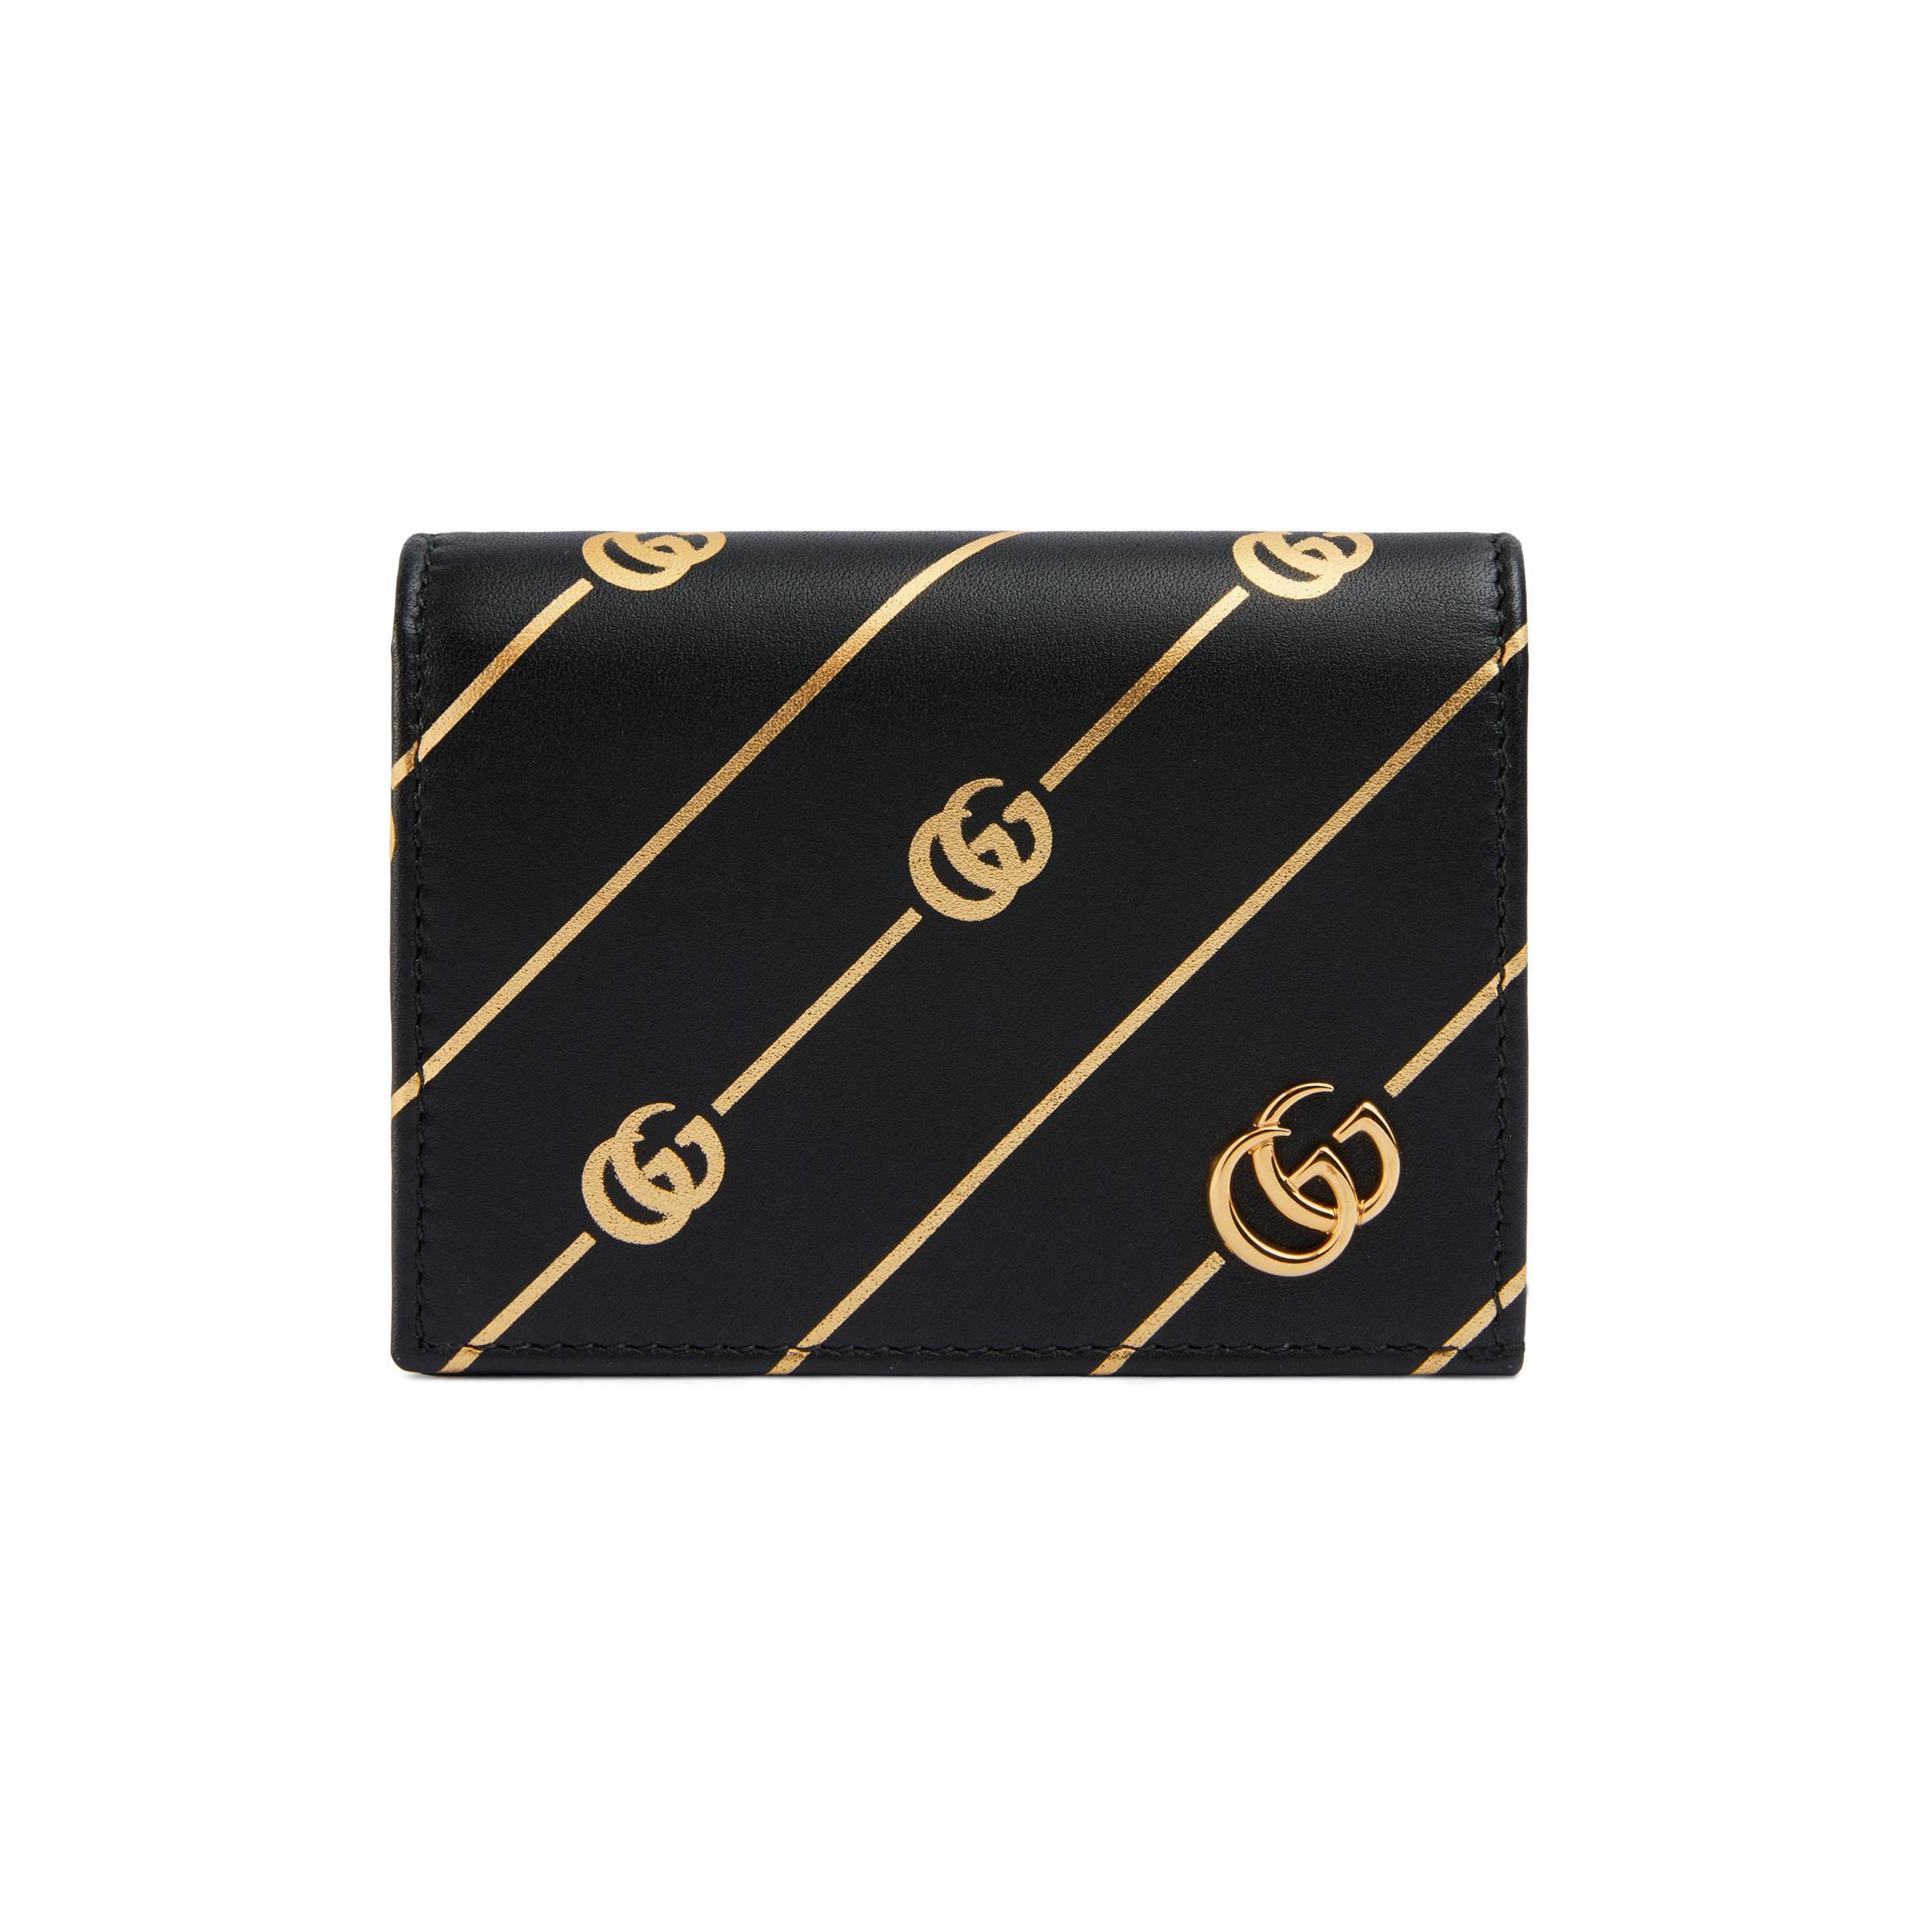 8d21bb72e Lyst - Tarjetero de Piel con Rayas y Doble G Gucci de color Negro